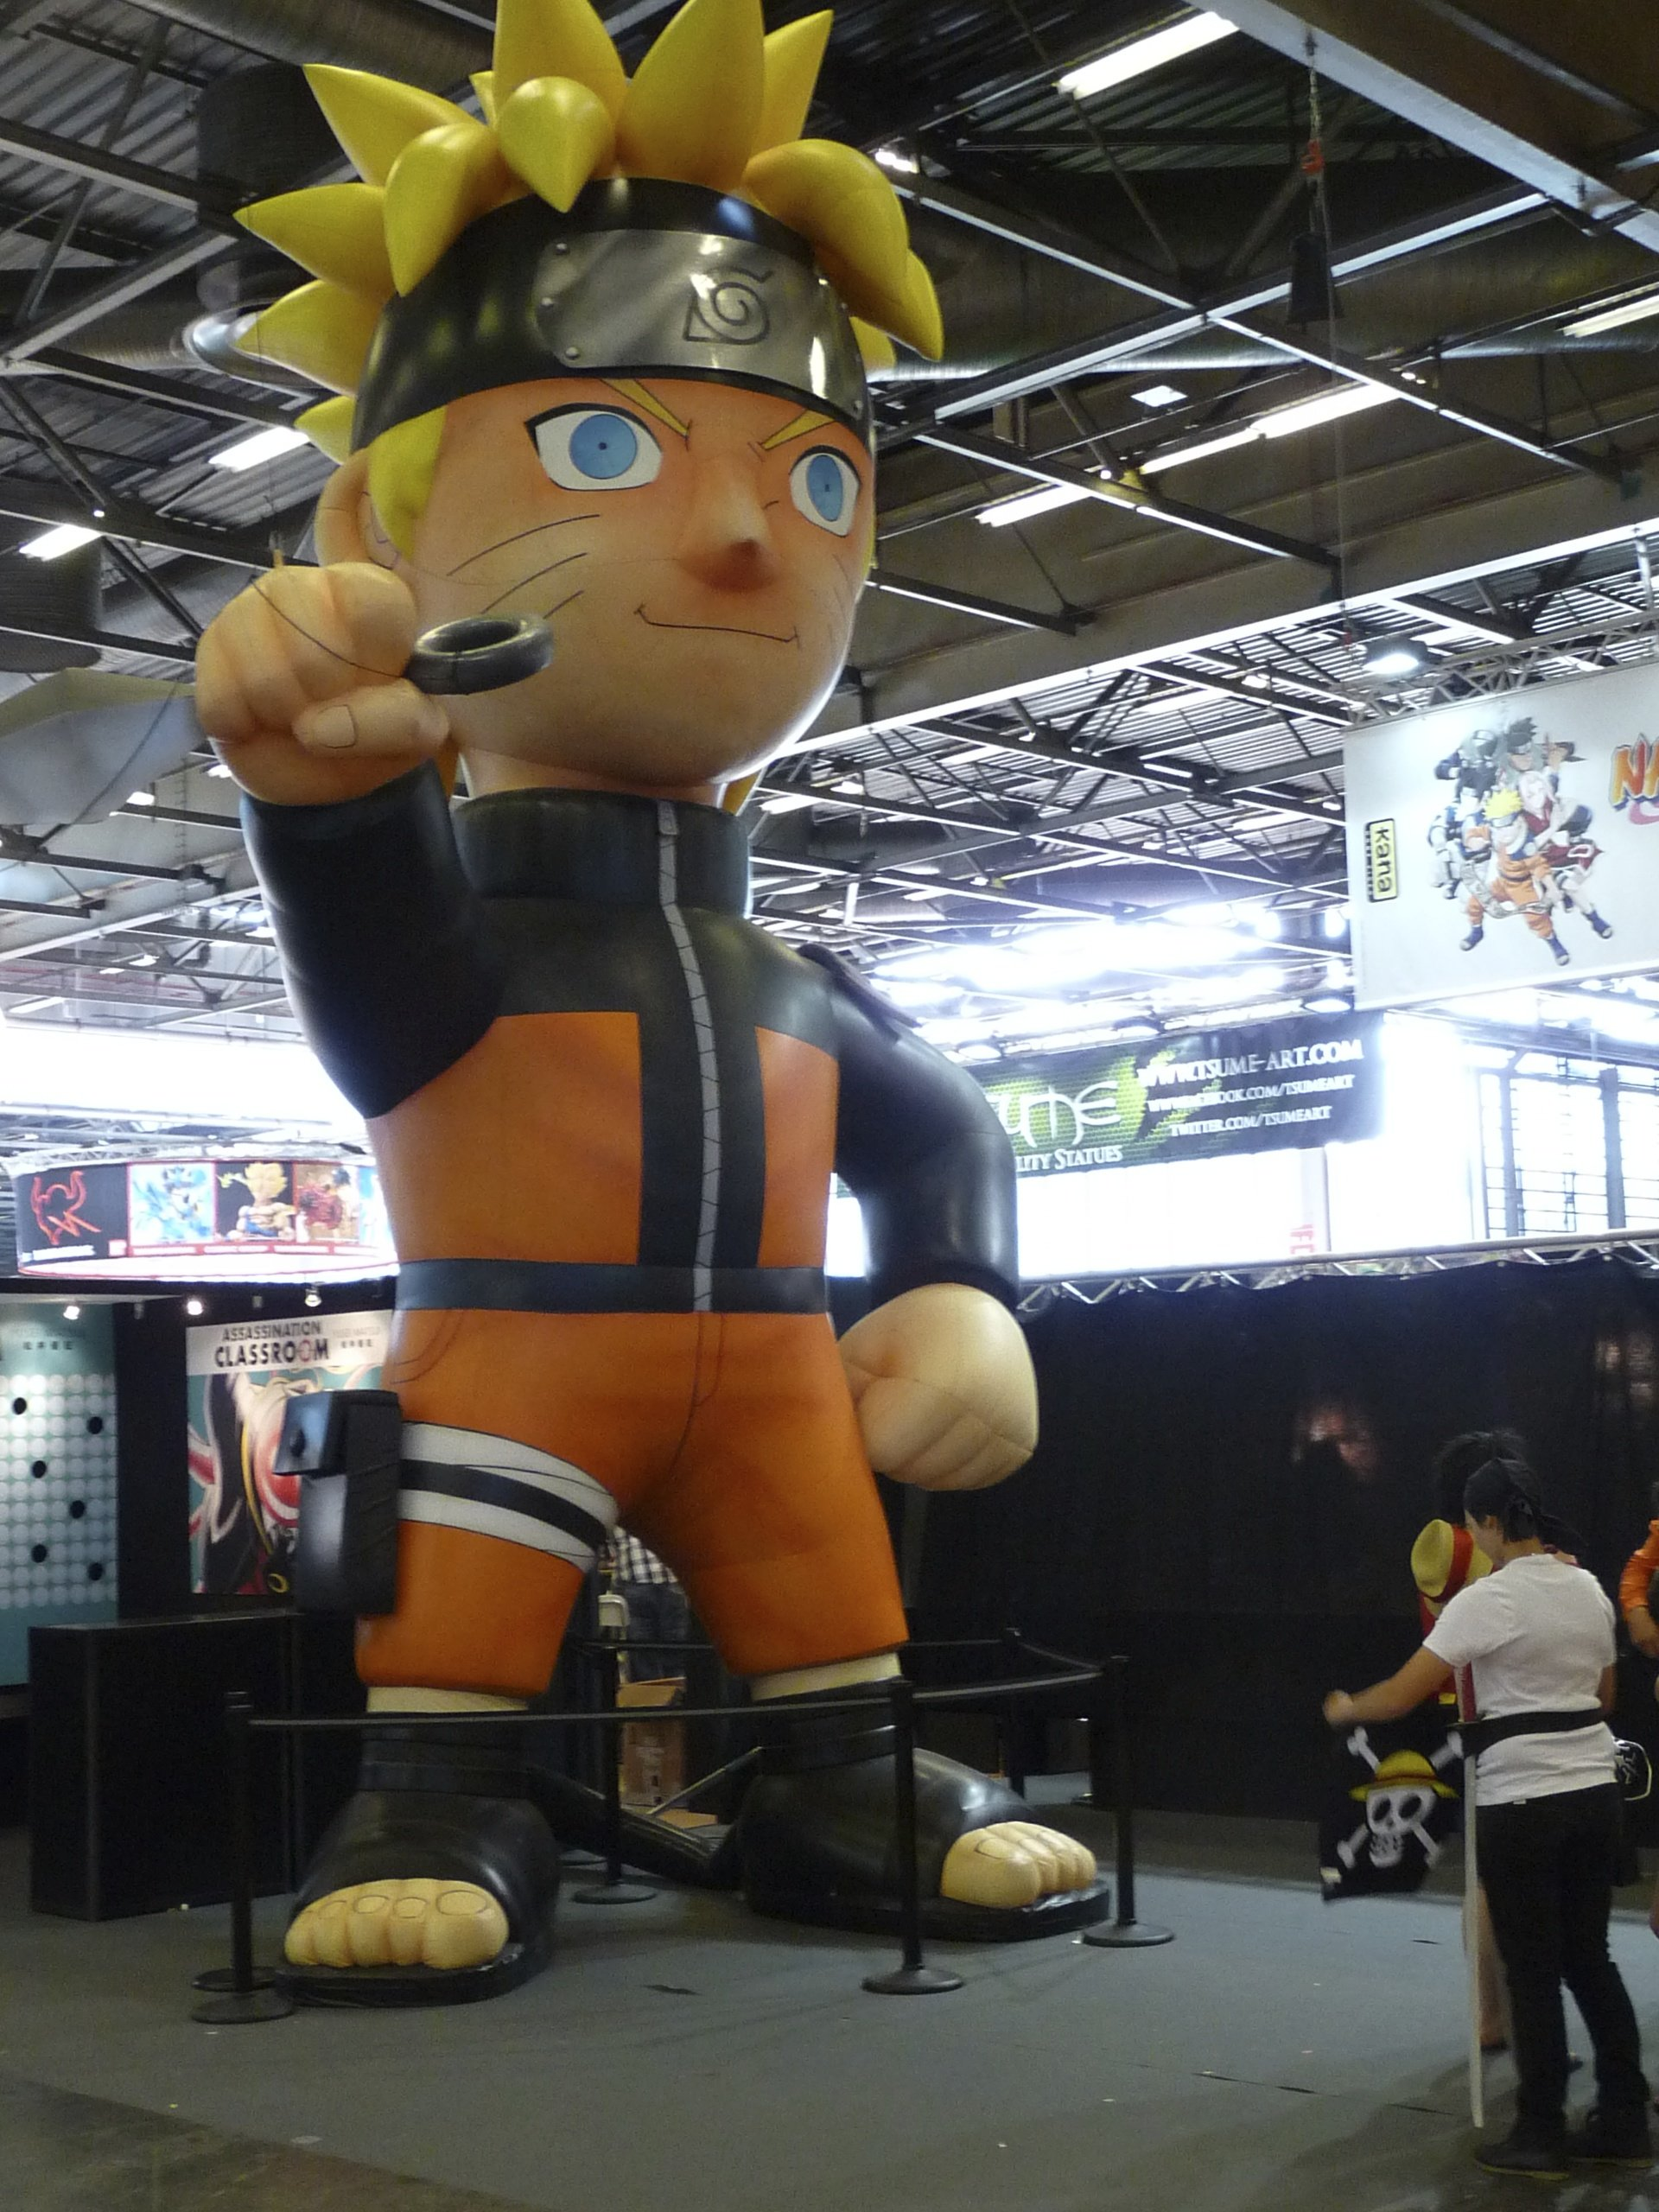 naruto - Japan Expo 2013